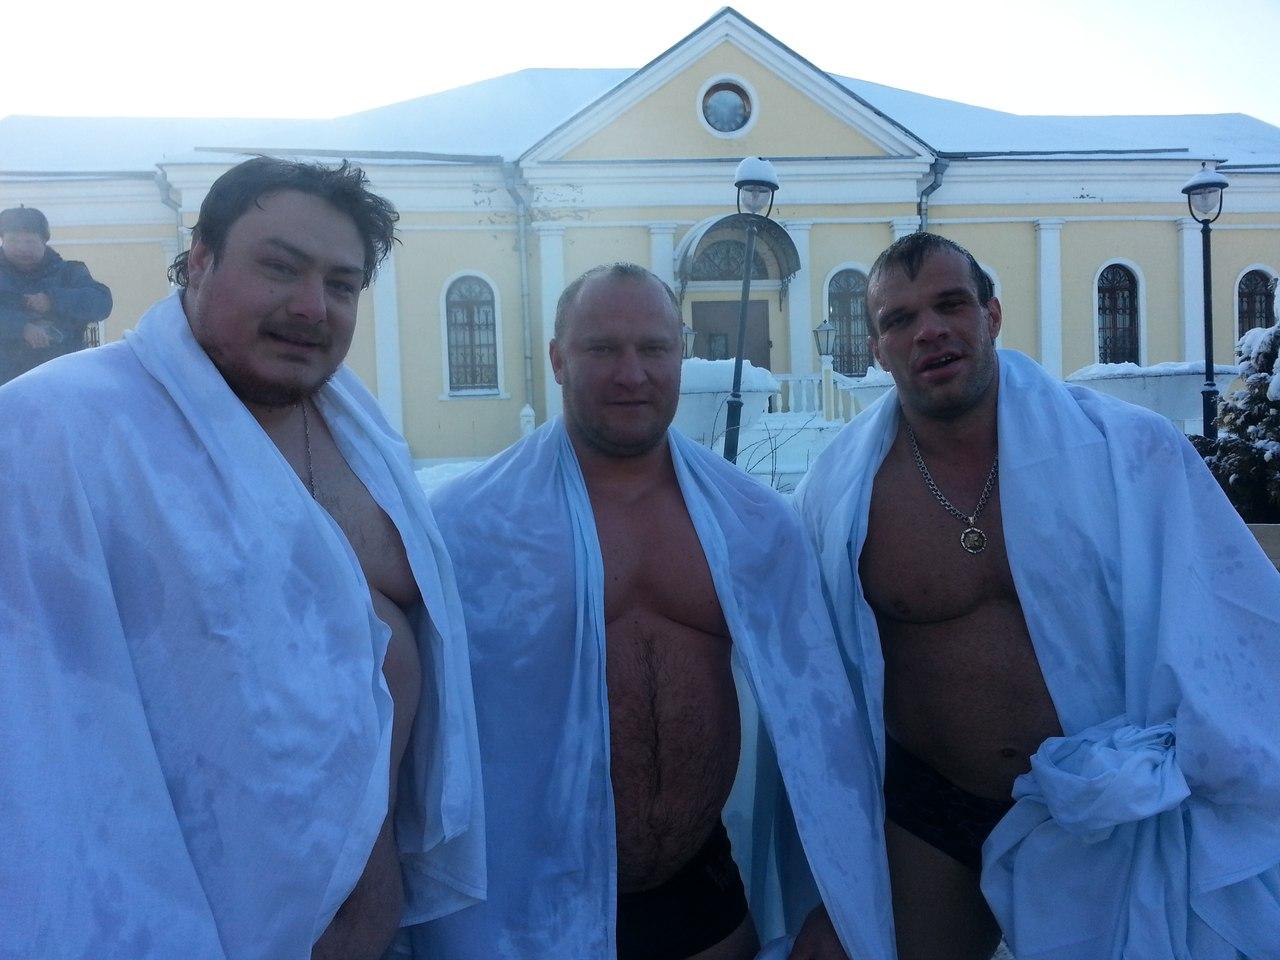 Denis Cyplenkov after winter bath  │ Photo Source: Den Denov